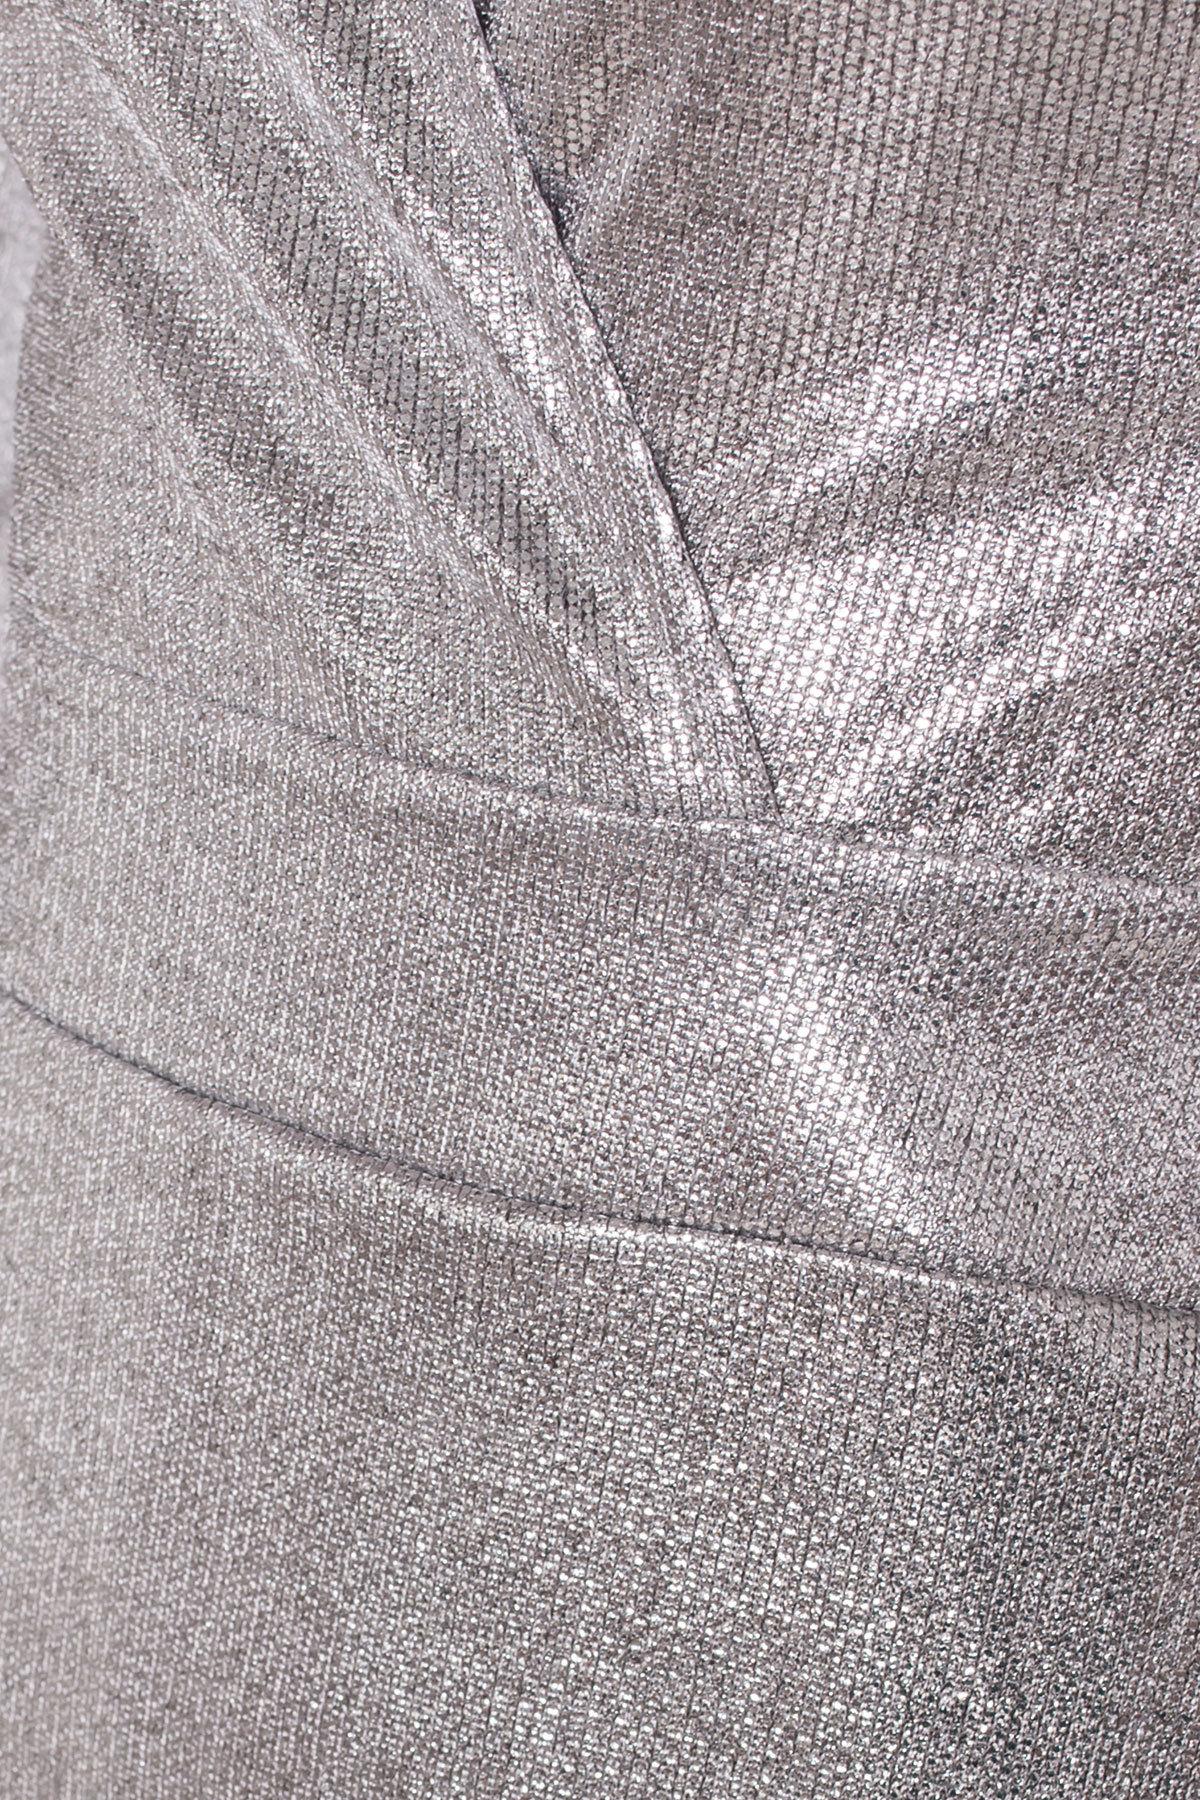 Комбинезон с шортами цвета металлик Шелли 8553 АРТ. 44892 Цвет: Серый/серебро - фото 7, интернет магазин tm-modus.ru